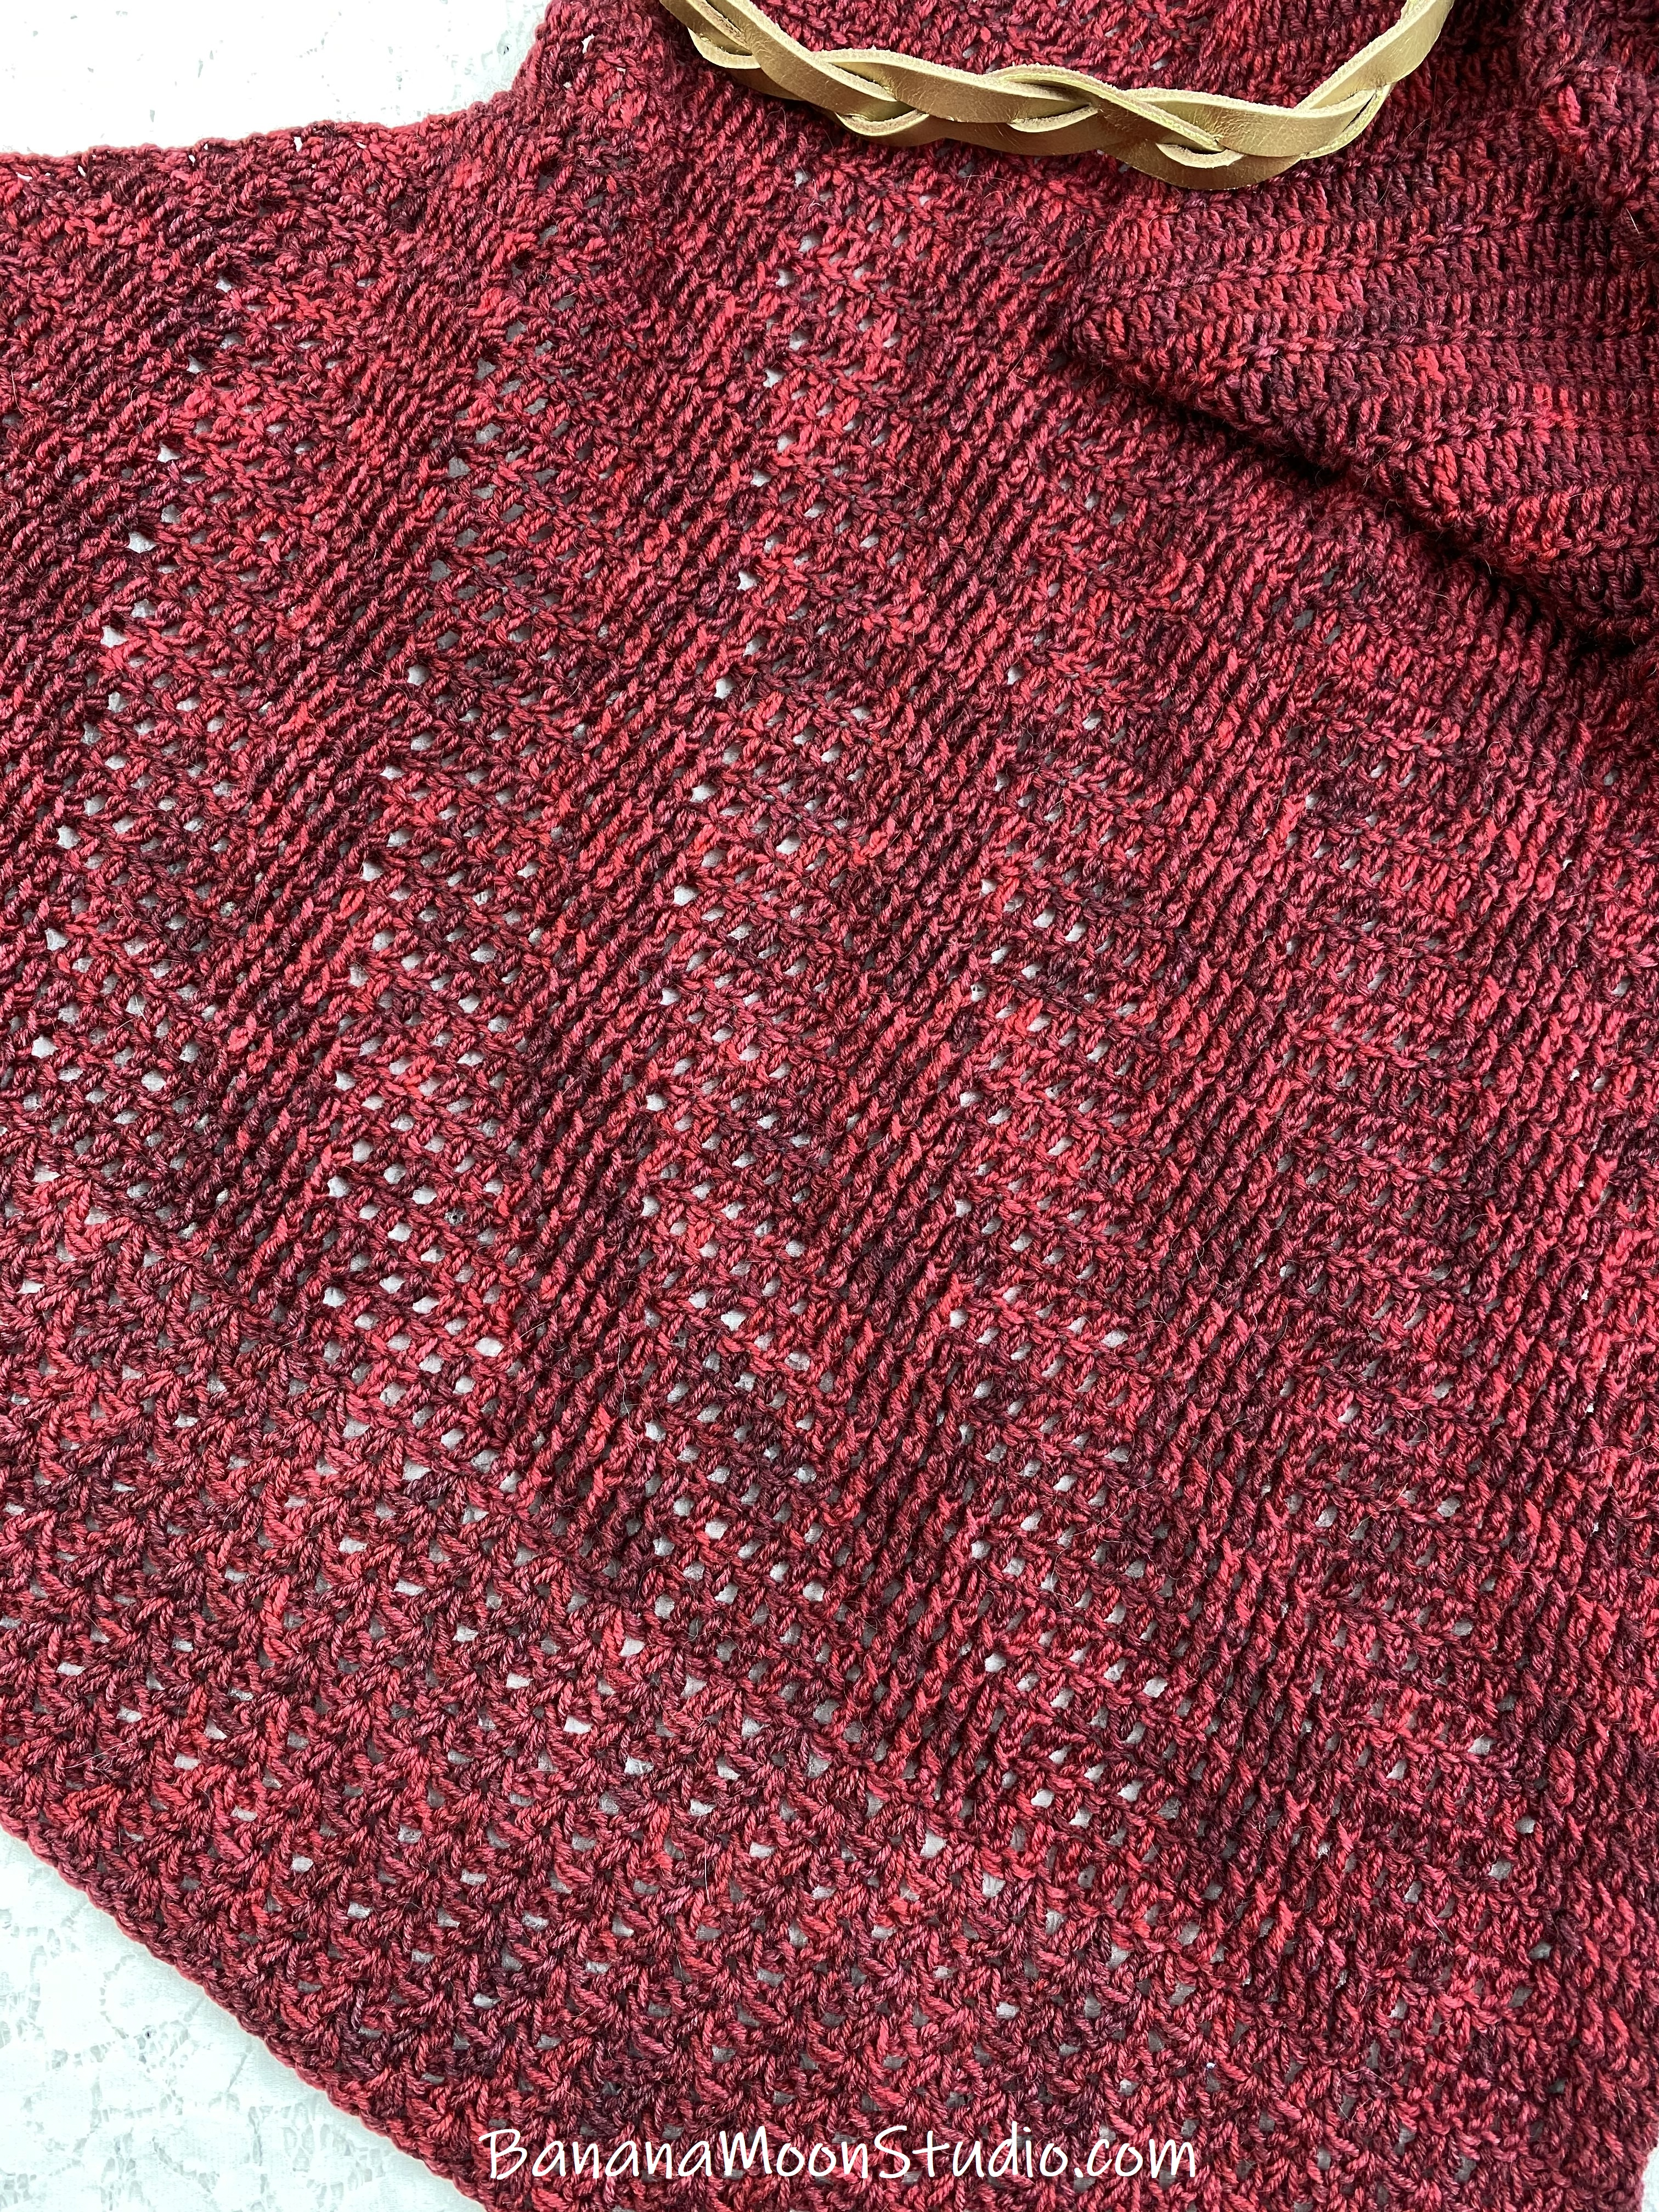 Close up of red crochet shawl with gold leather braid shawl cuff. Codex Alera CAL with Banana Moon Studio and Ancient Arts Yarn.